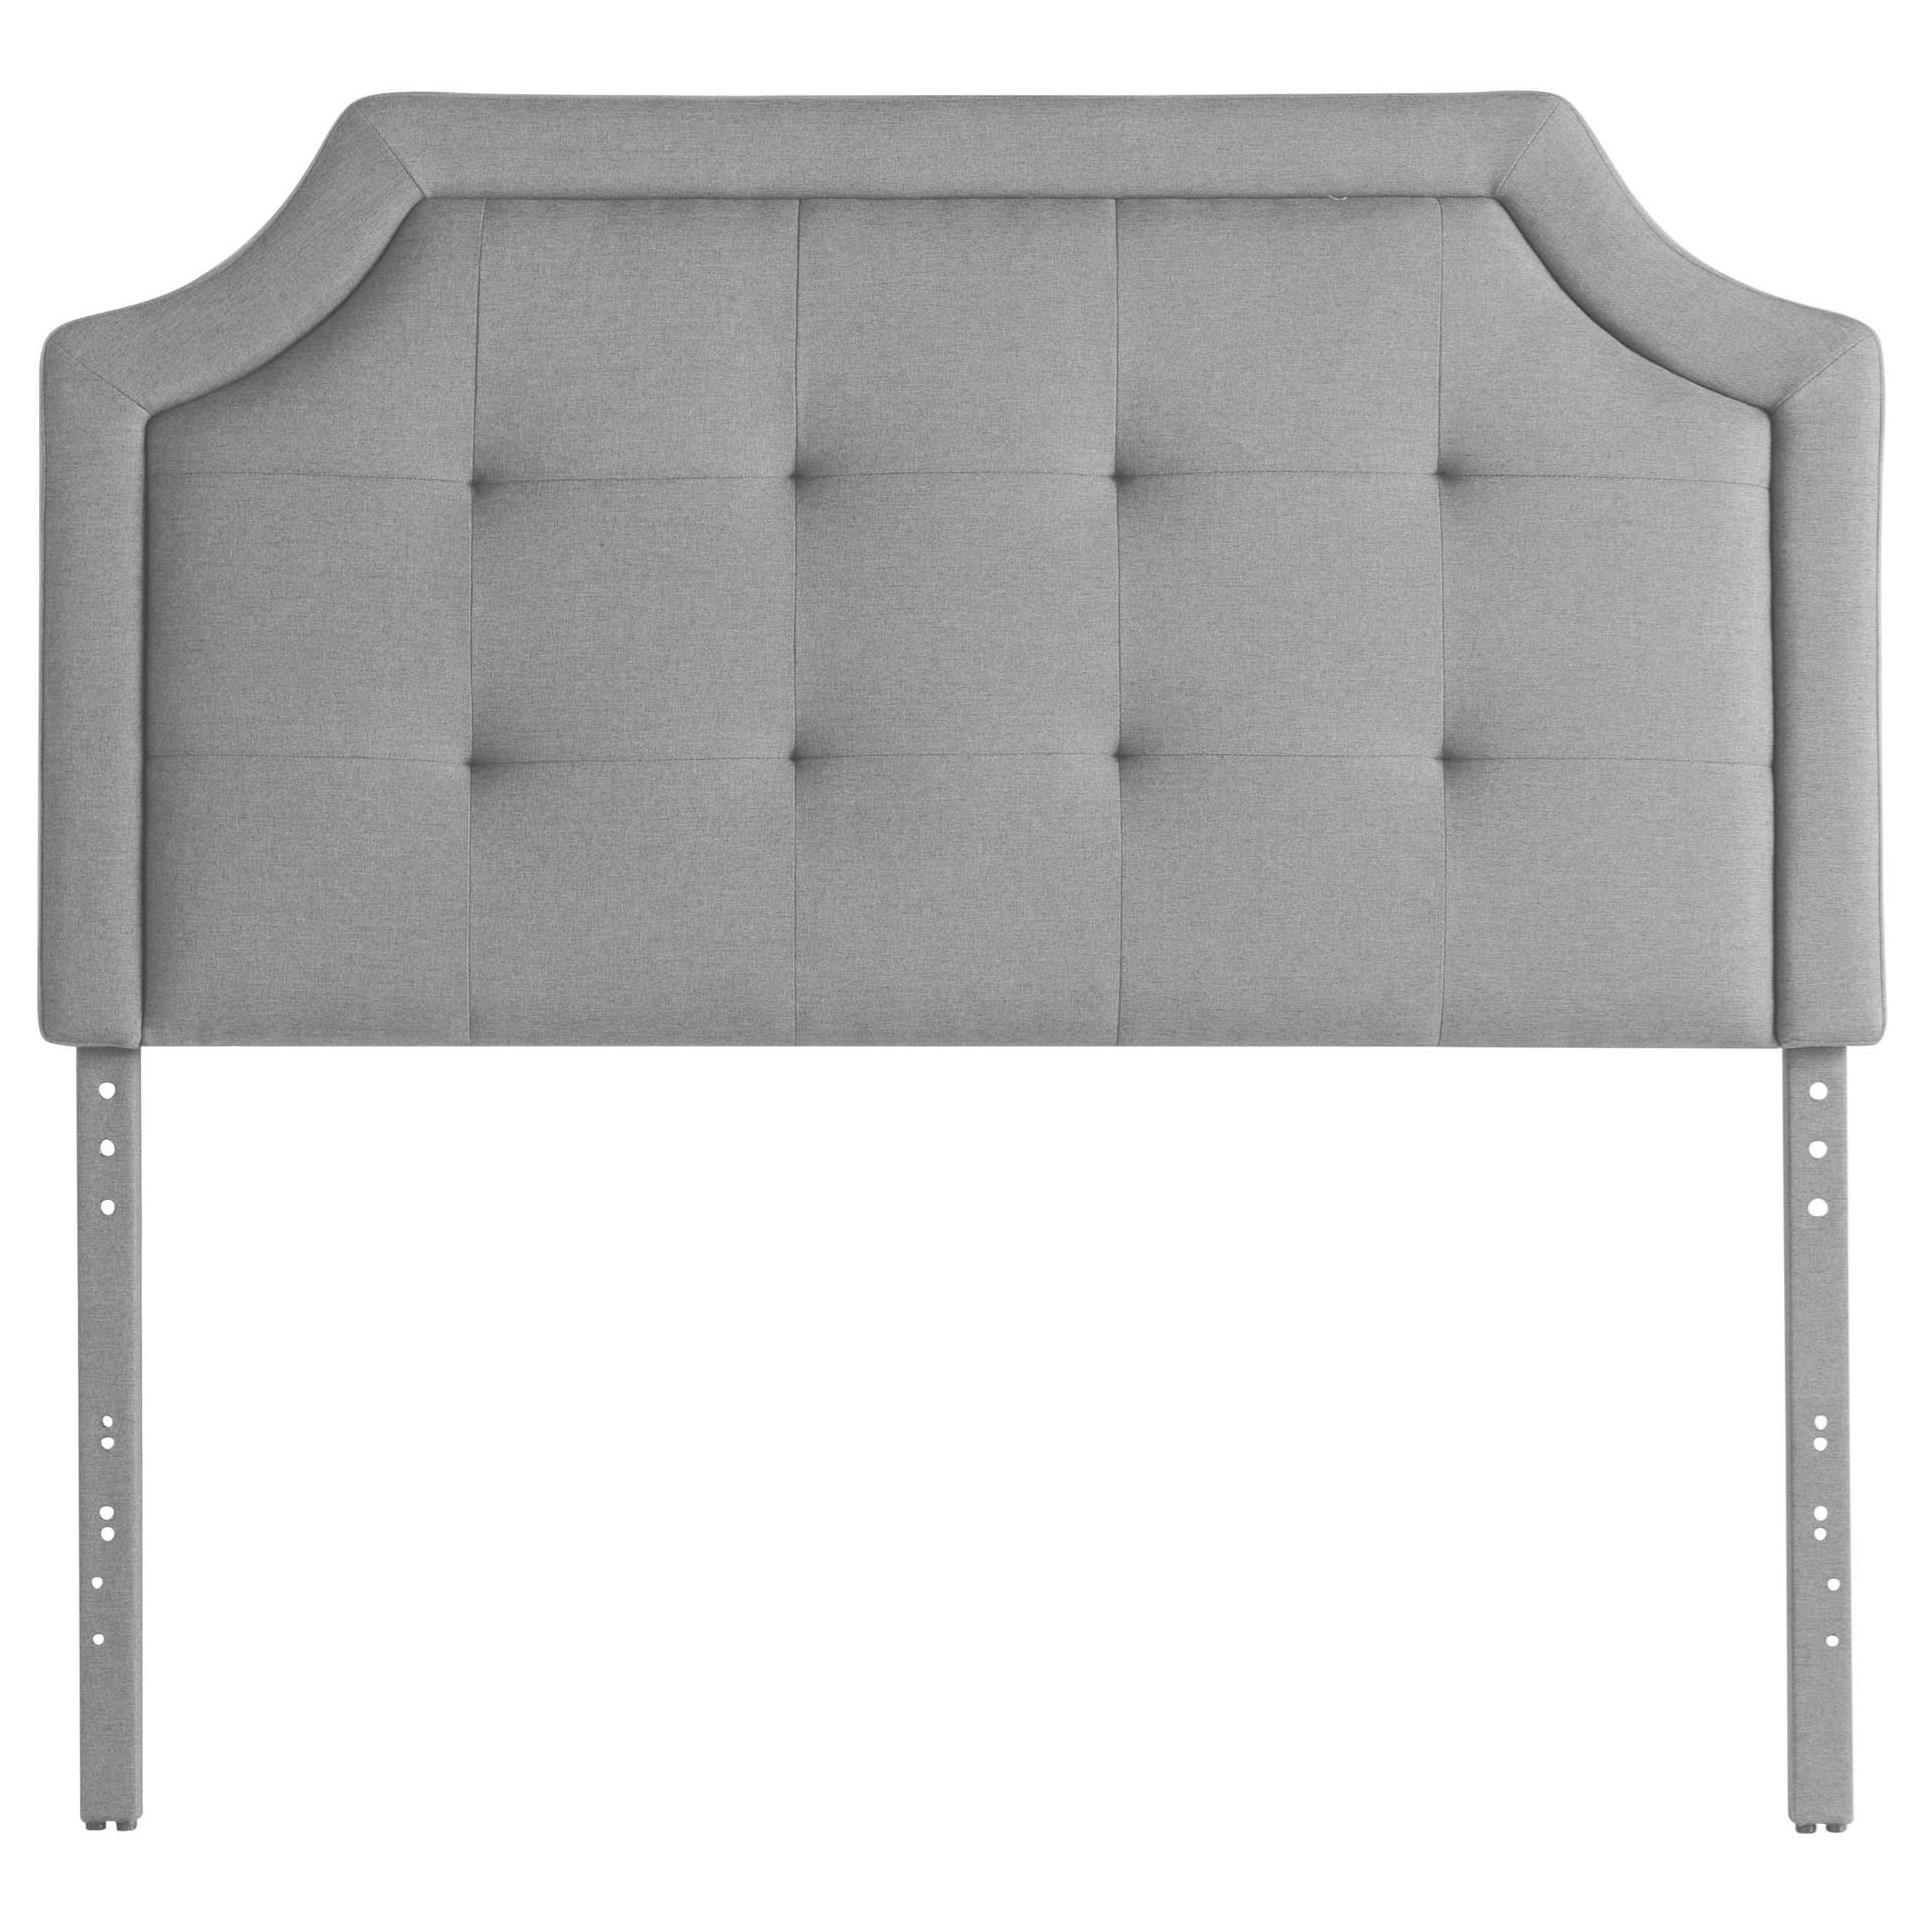 Carlisle Queen Headboard by Malouf at HomeWorld Furniture